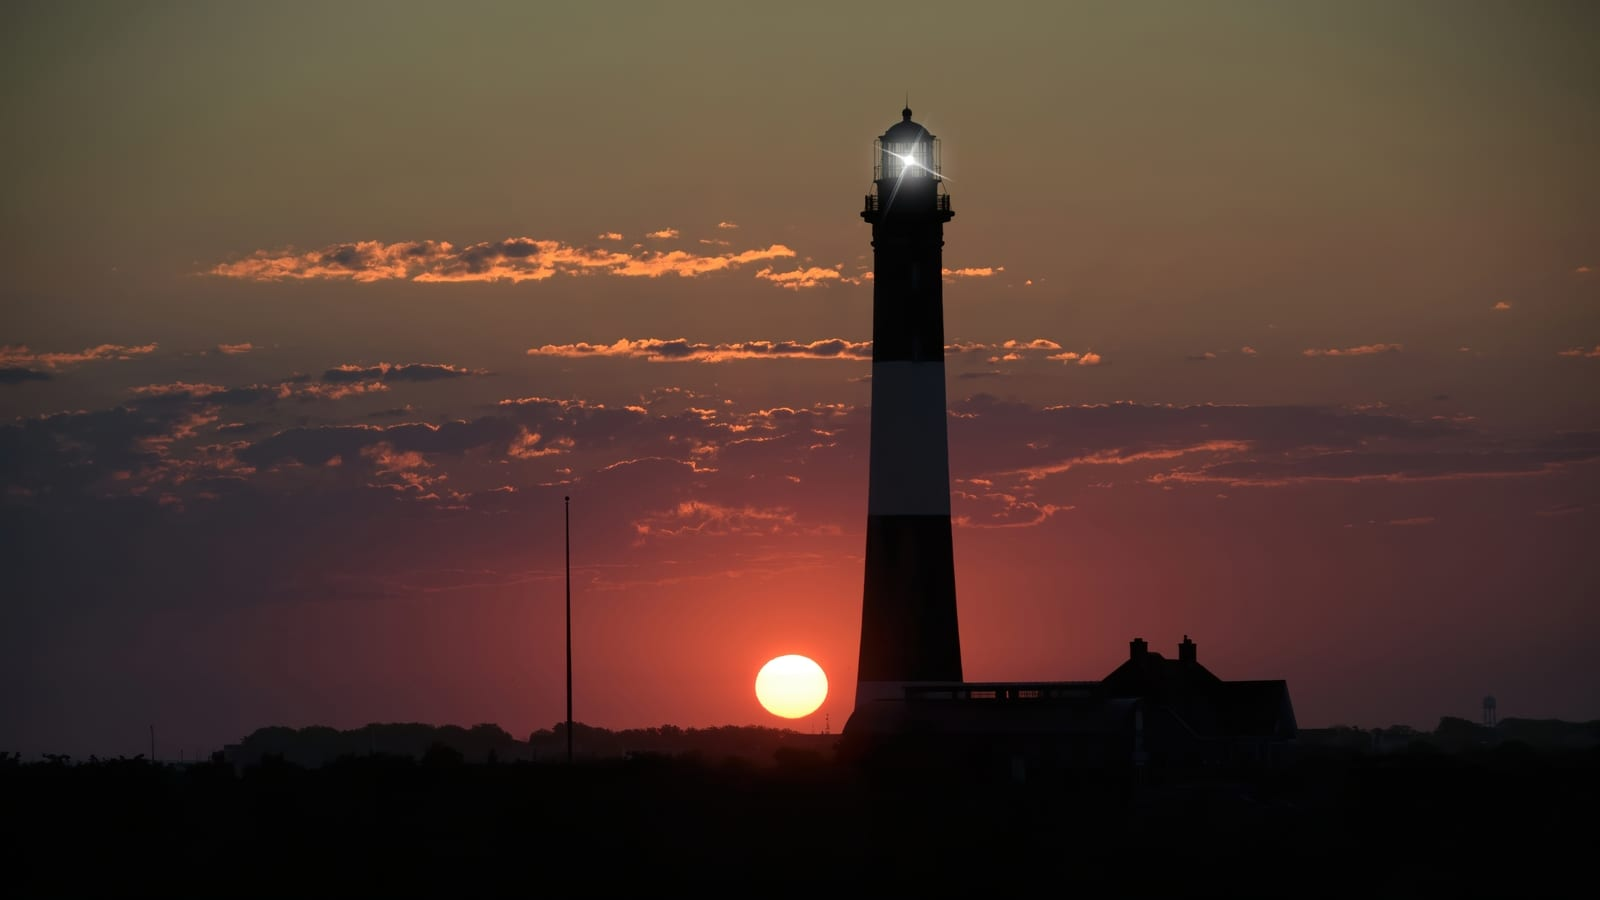 Shoreham (Suffolk County) Long Island, NY Private Investigator